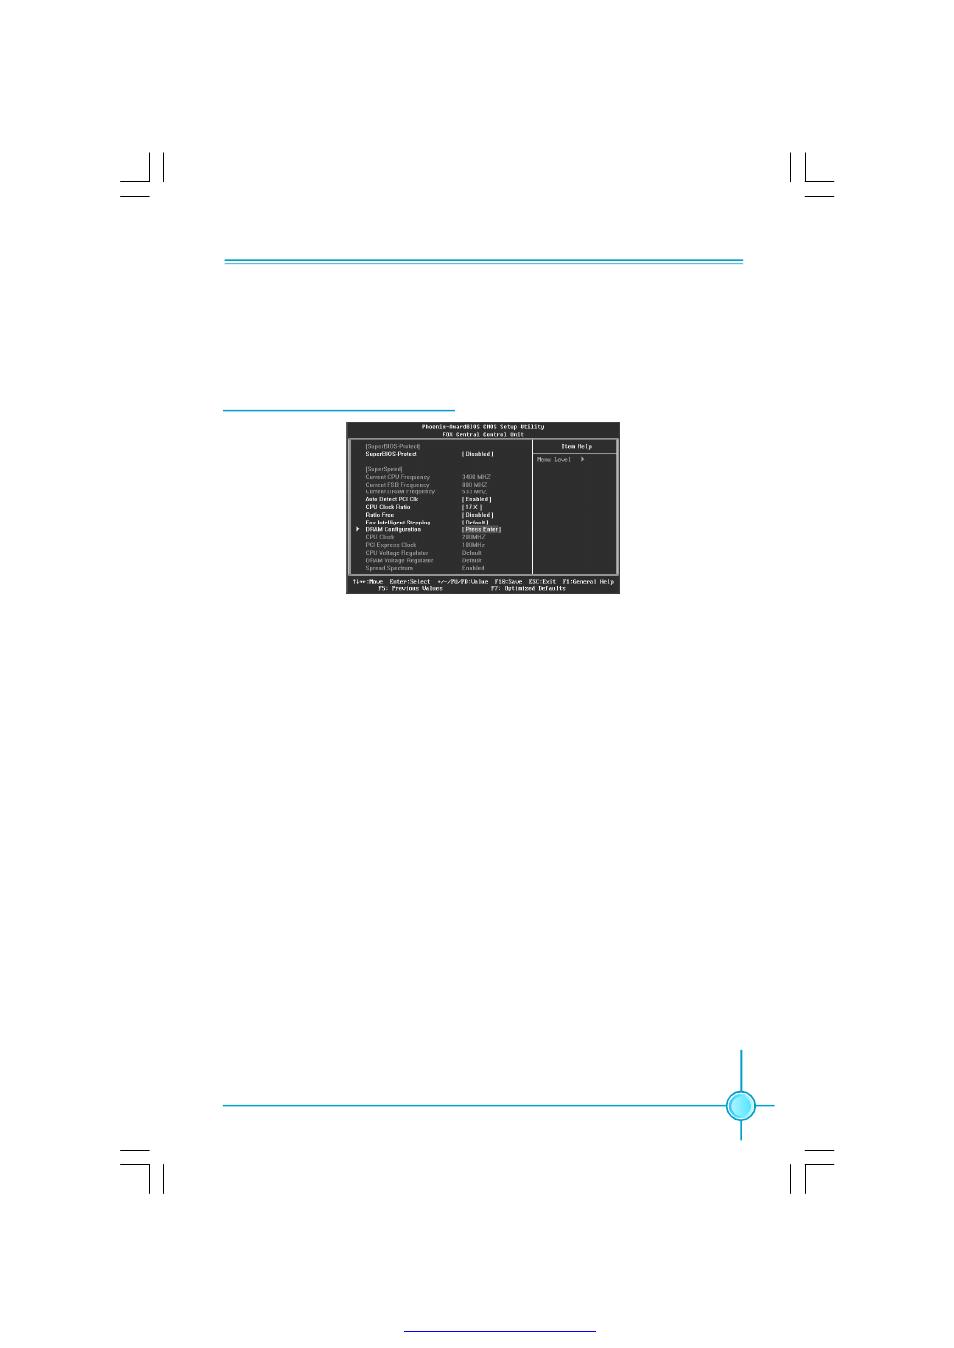 Foxconn 45cmx User Manual Daihatsu Yrv Turbo Wiring Diagram Background Image Array Page 29 47 Also For 45gmx V Rh Manualsdir